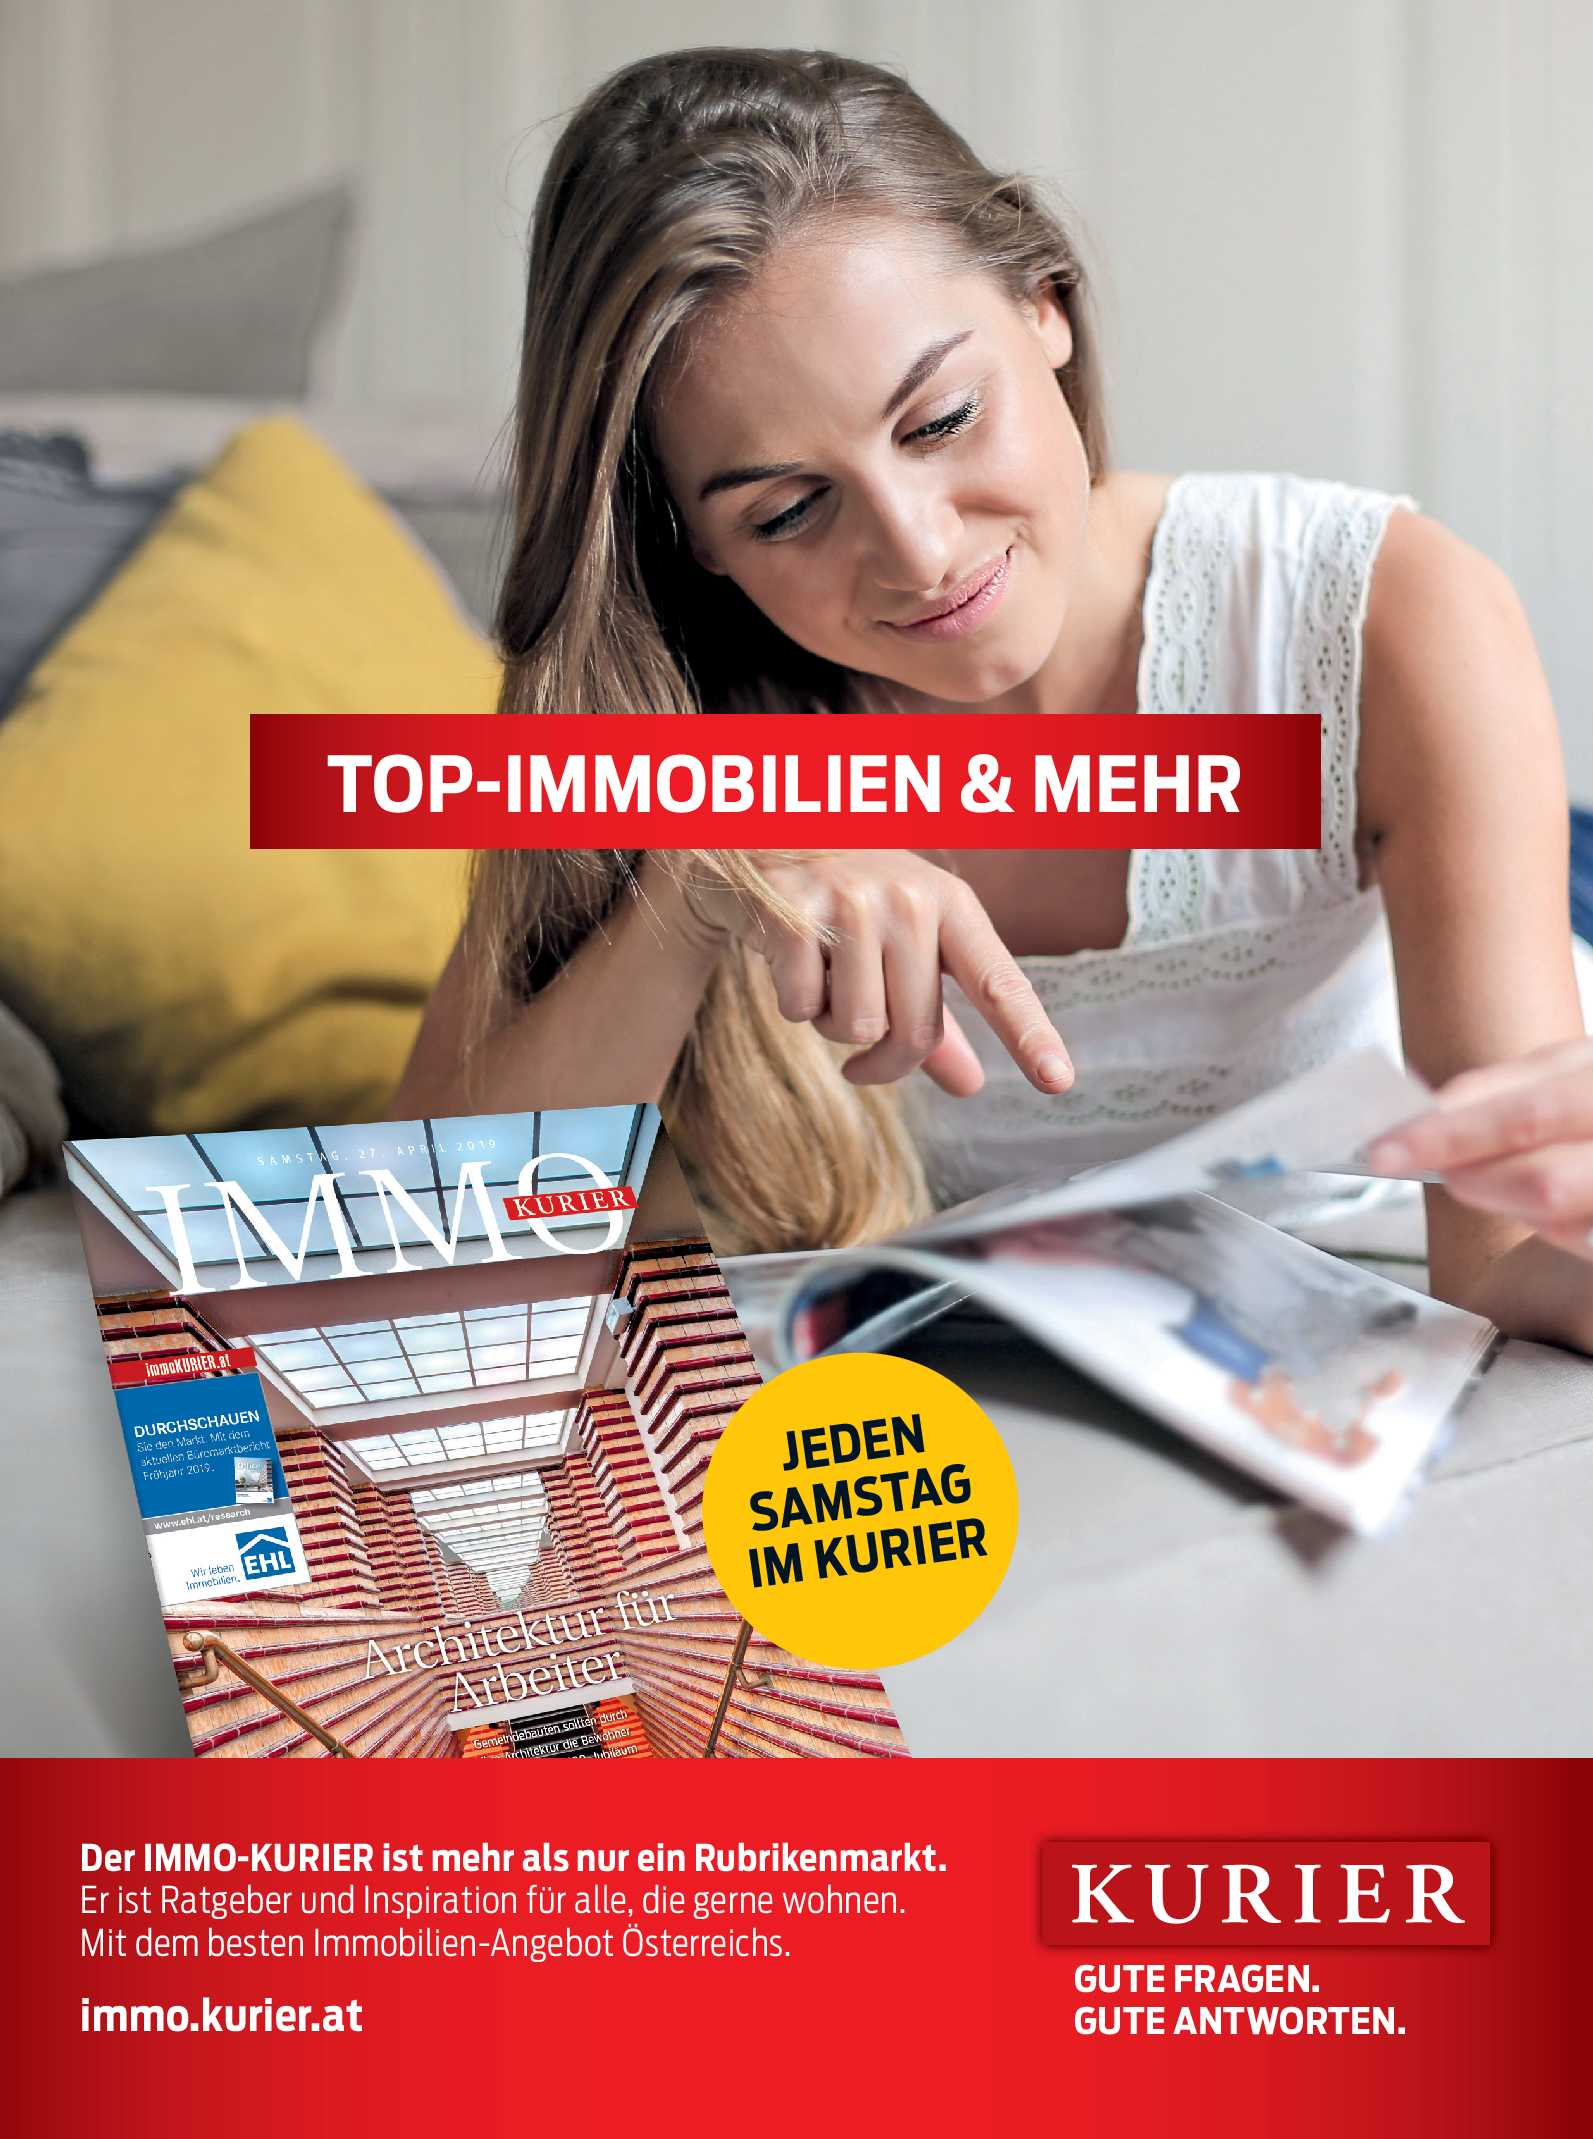 public/epaper/imported/20200930/kurier/magazin/magazin_20200930_053.jpg